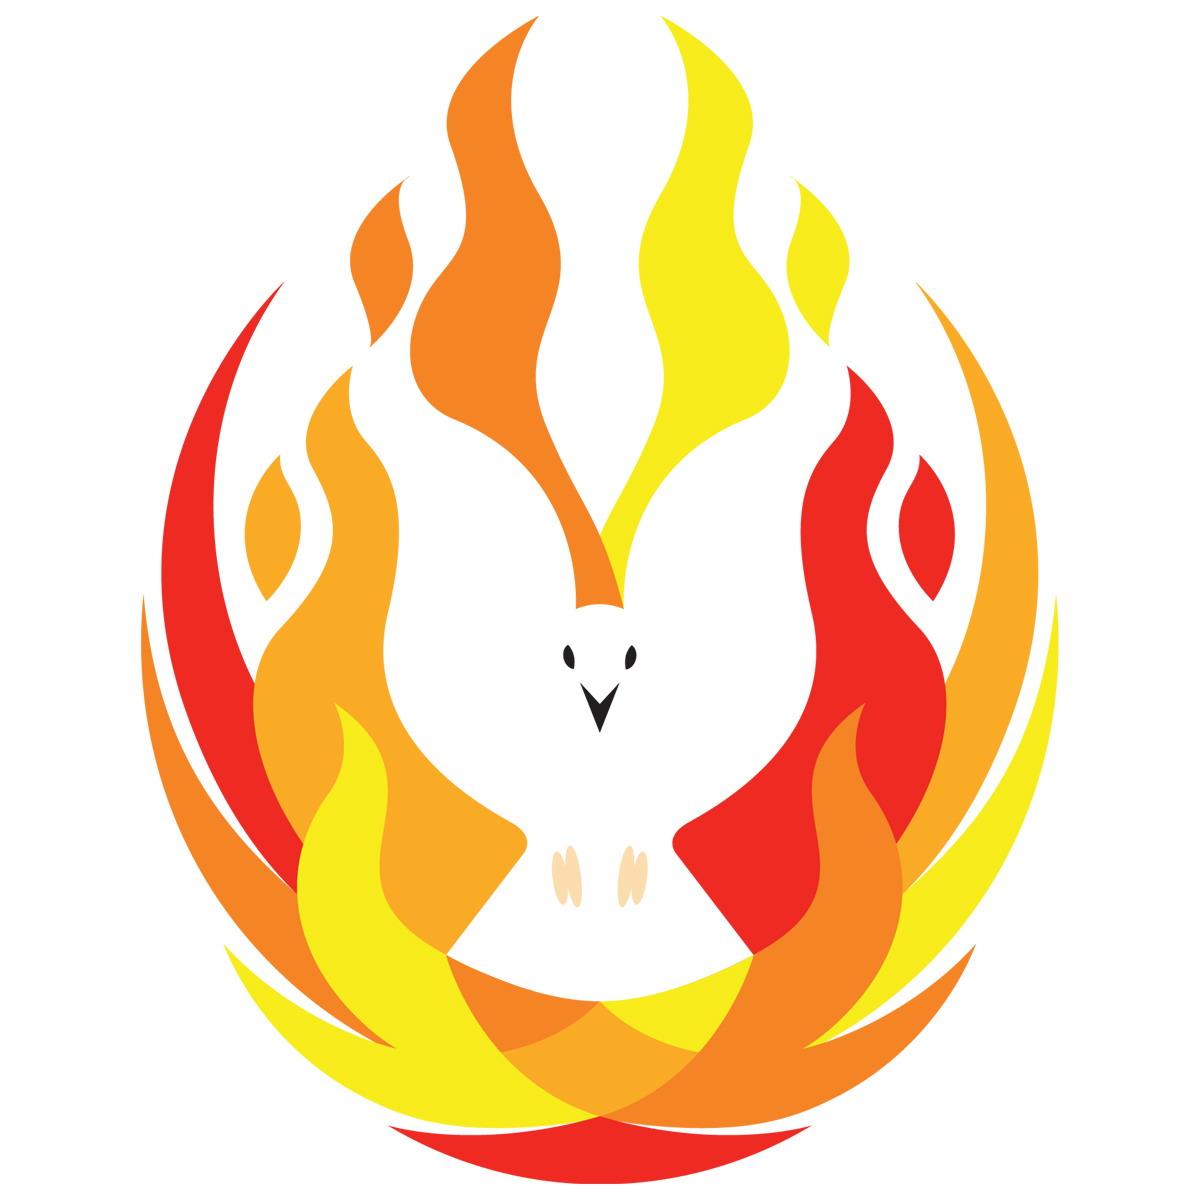 holy spirit dove clipart pentecost fire dove groton united church rh grotonucc org pentecost clipart images pentecost clip art 2018